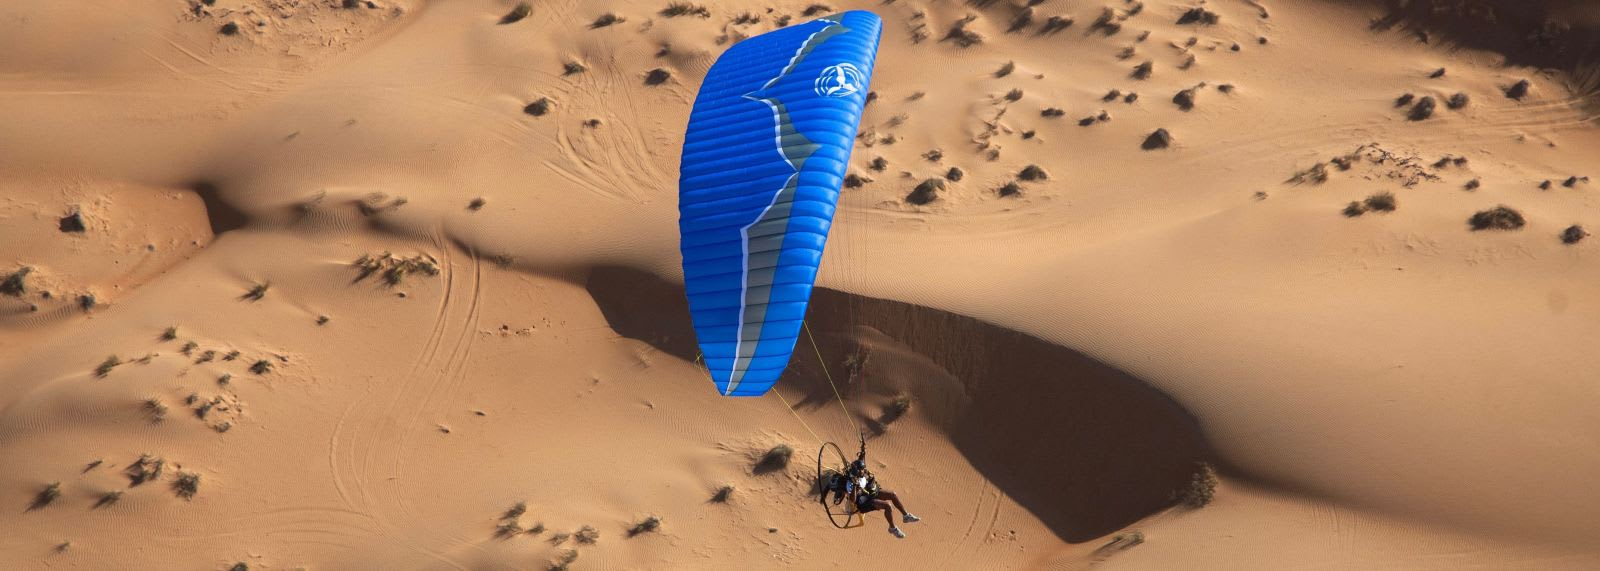 Paramotoring in the UAE